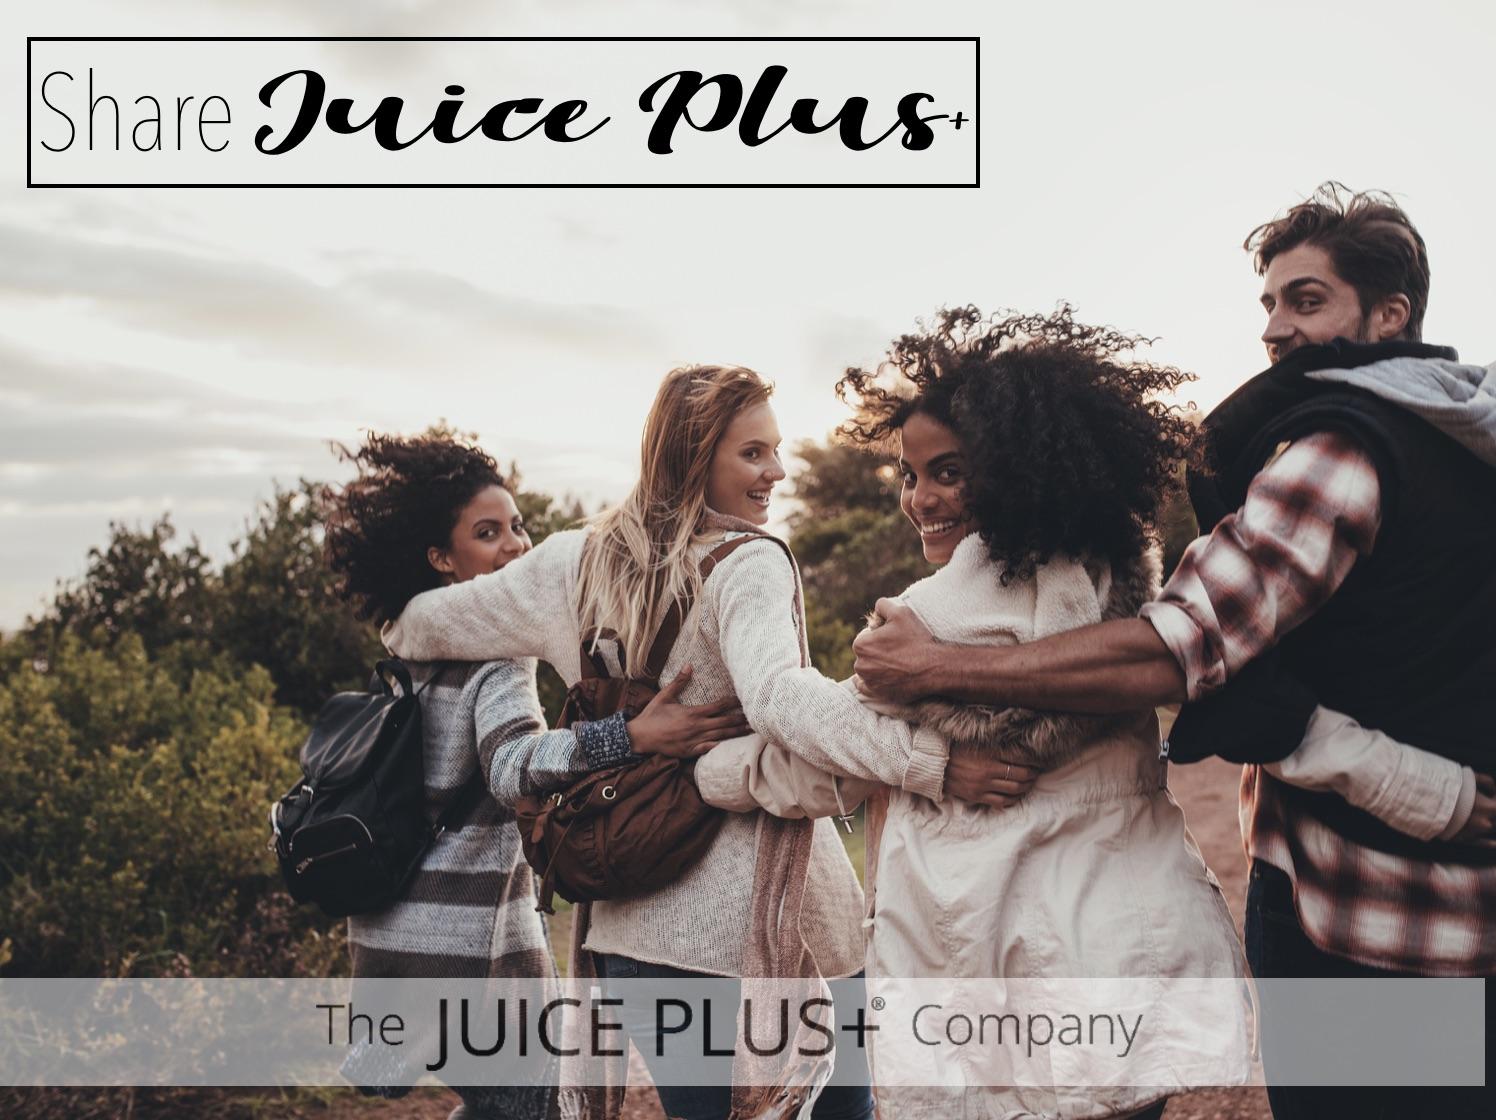 Share JP+Flip-Book - Click here